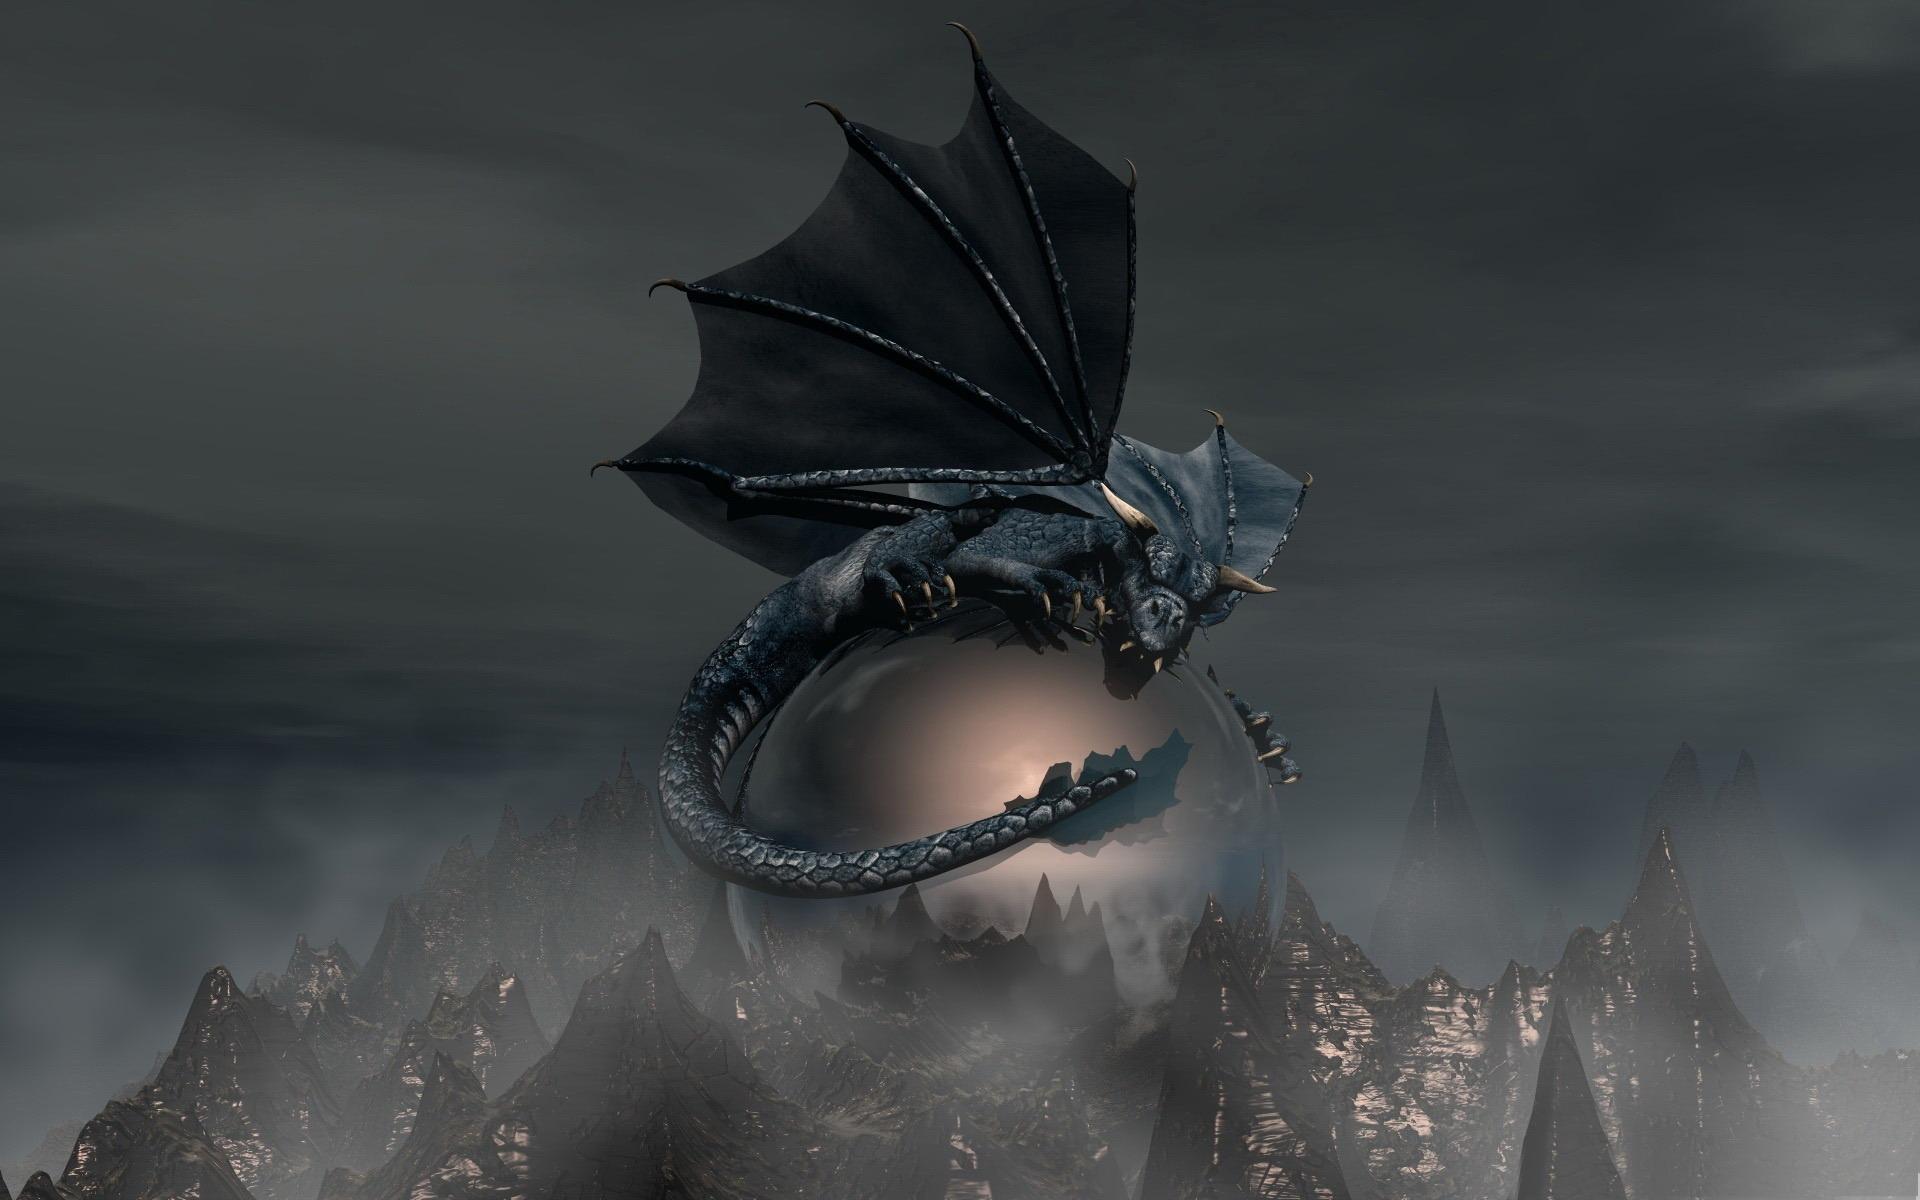 Hd wallpaper animal - Dragon Noir Dragon Art Wallpaper Design 1920x1200 Fond D